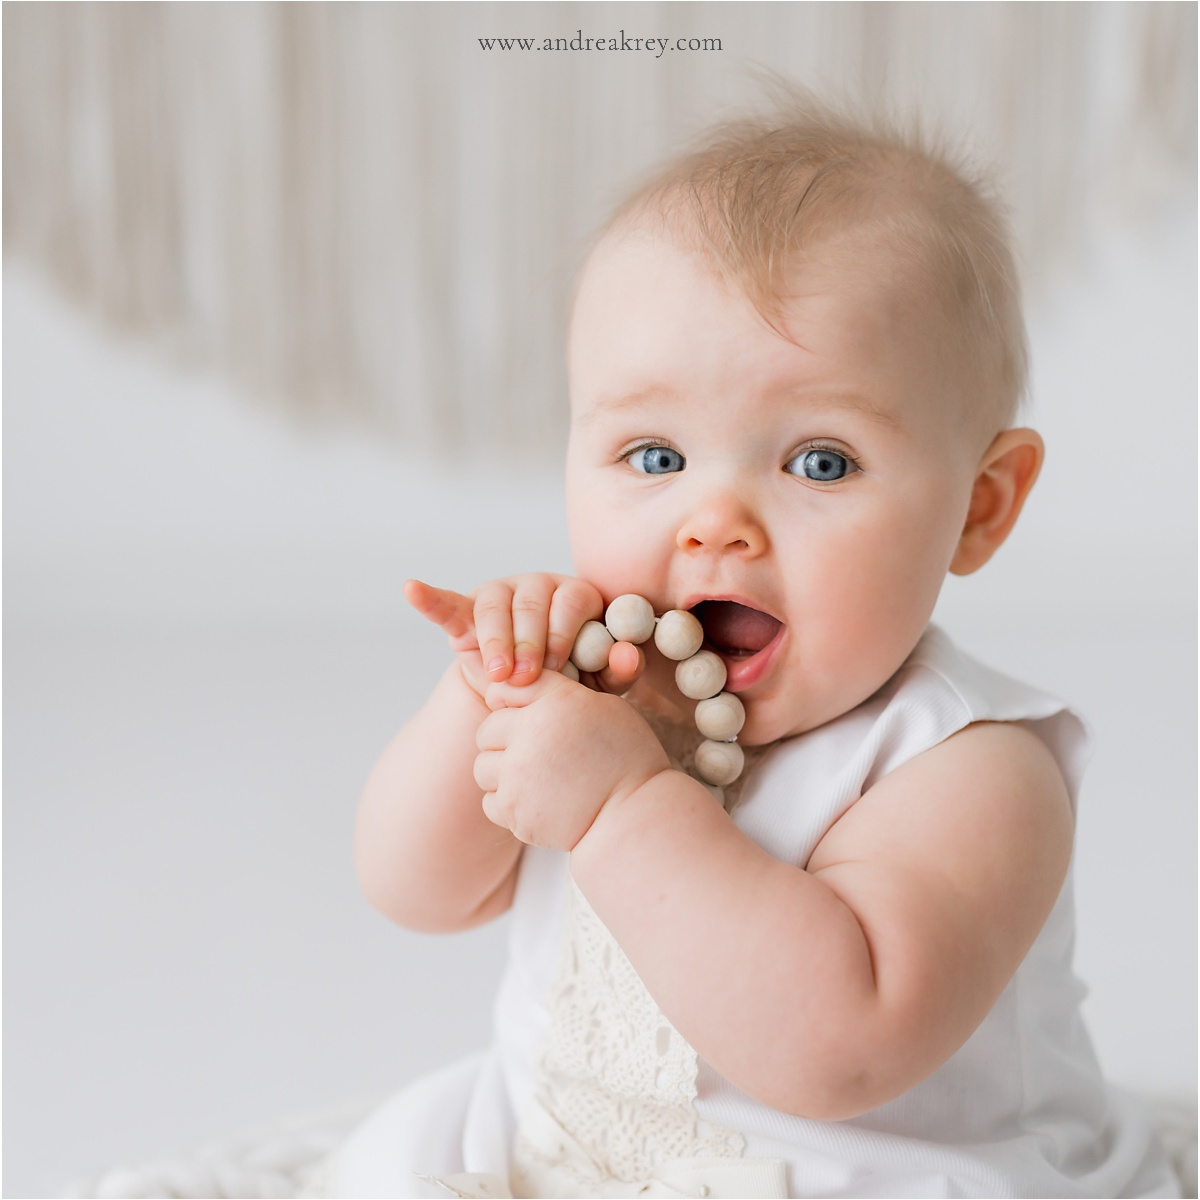 milestones-baby-photographers-savannah-ga.jpg